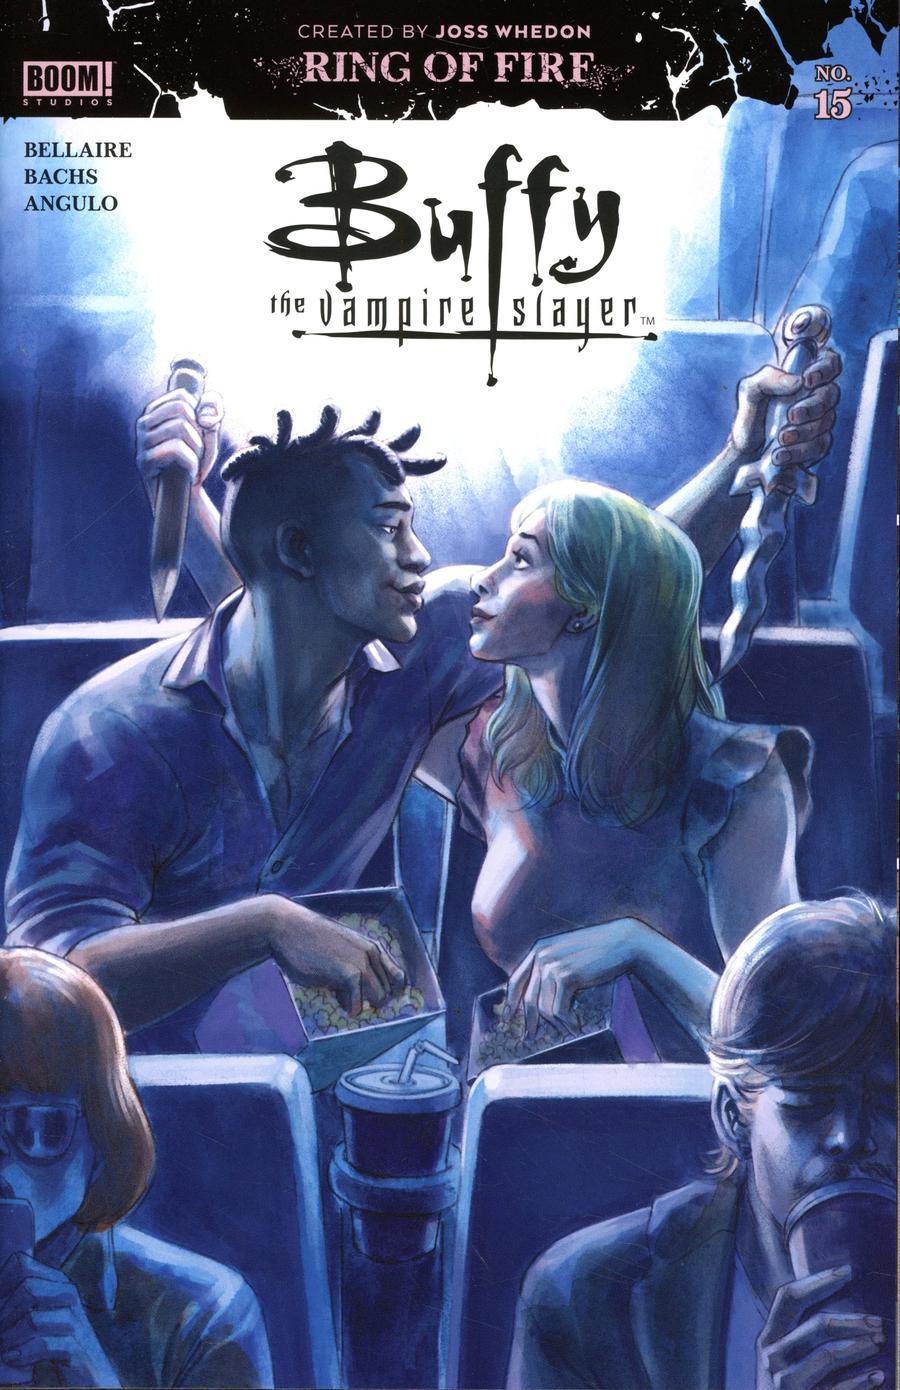 Buffy The Vampire Slayer Vol 2 #15 Cover A Regular David Lopez Cover